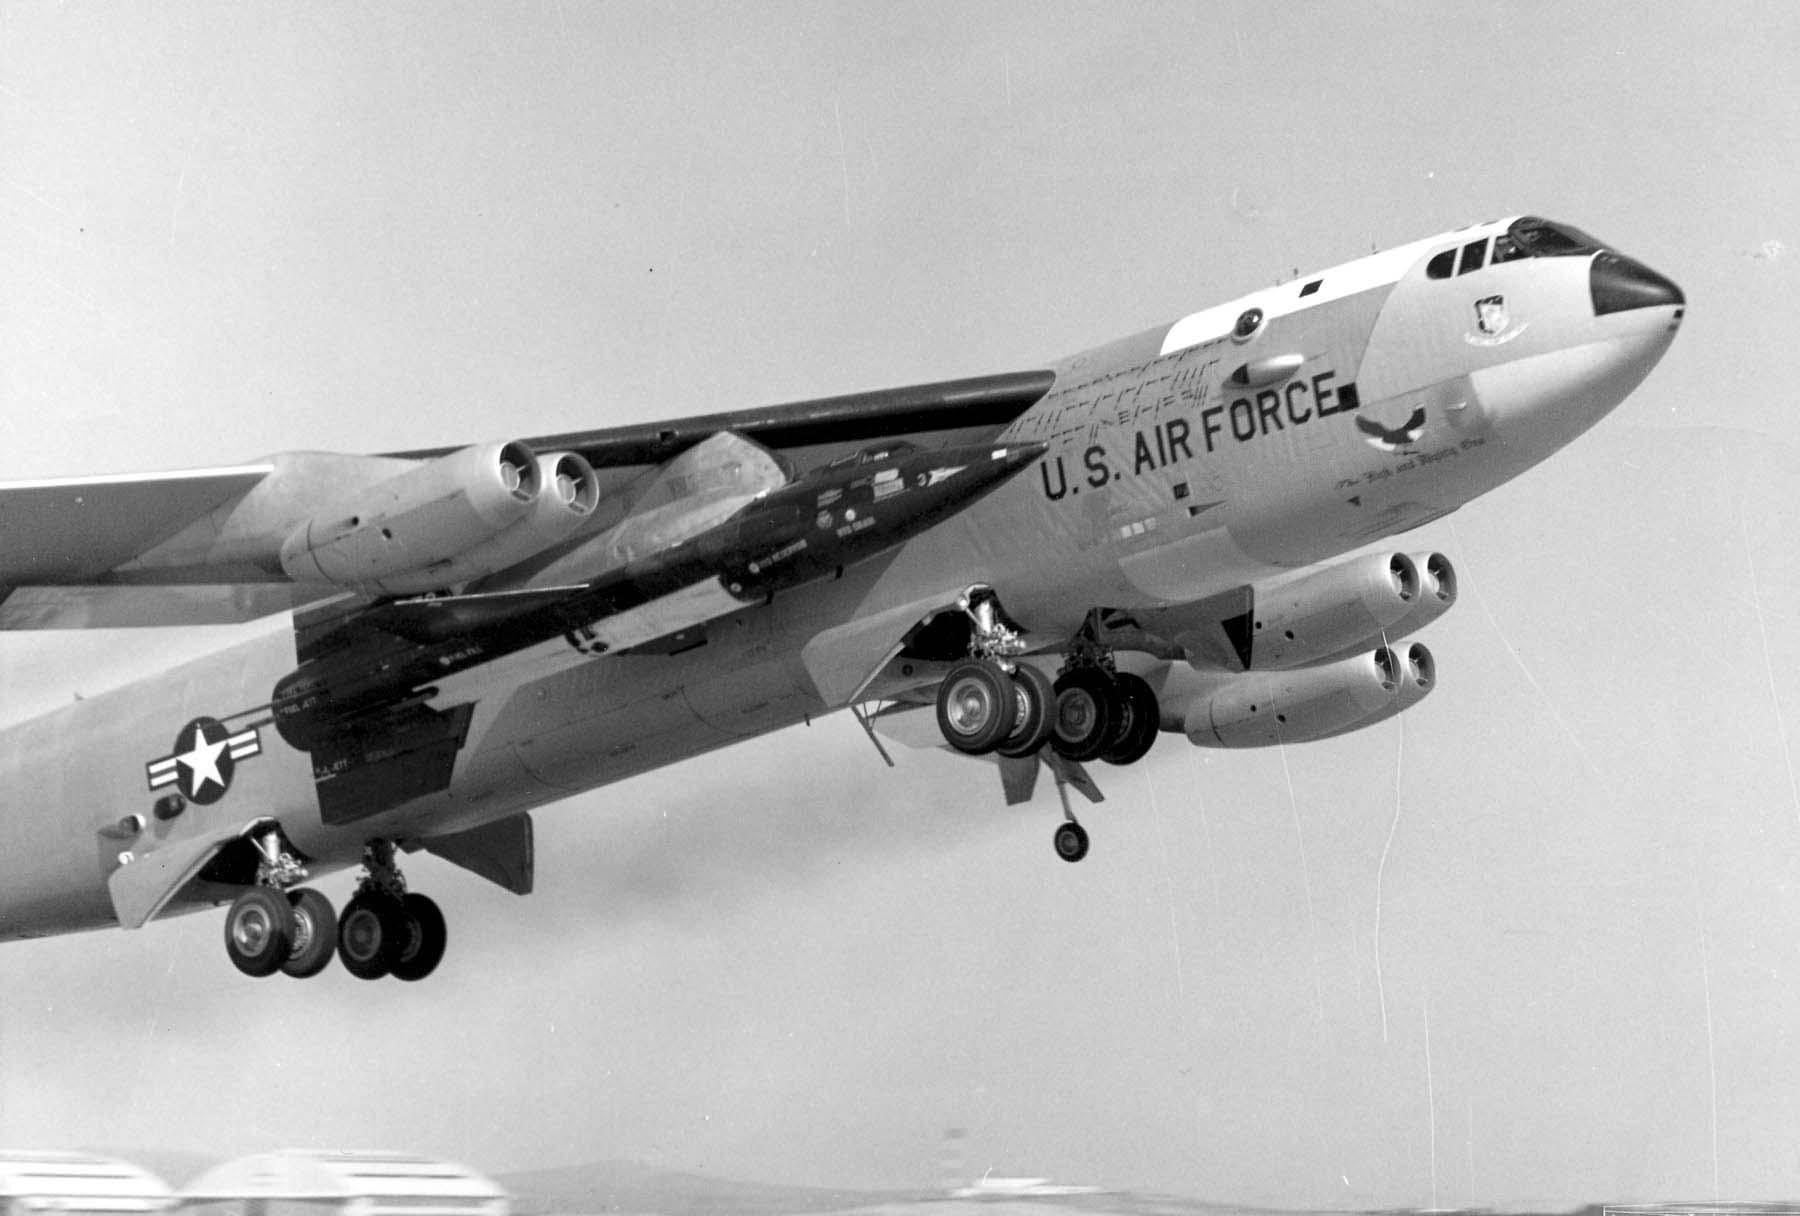 nasa b-52 - photo #25